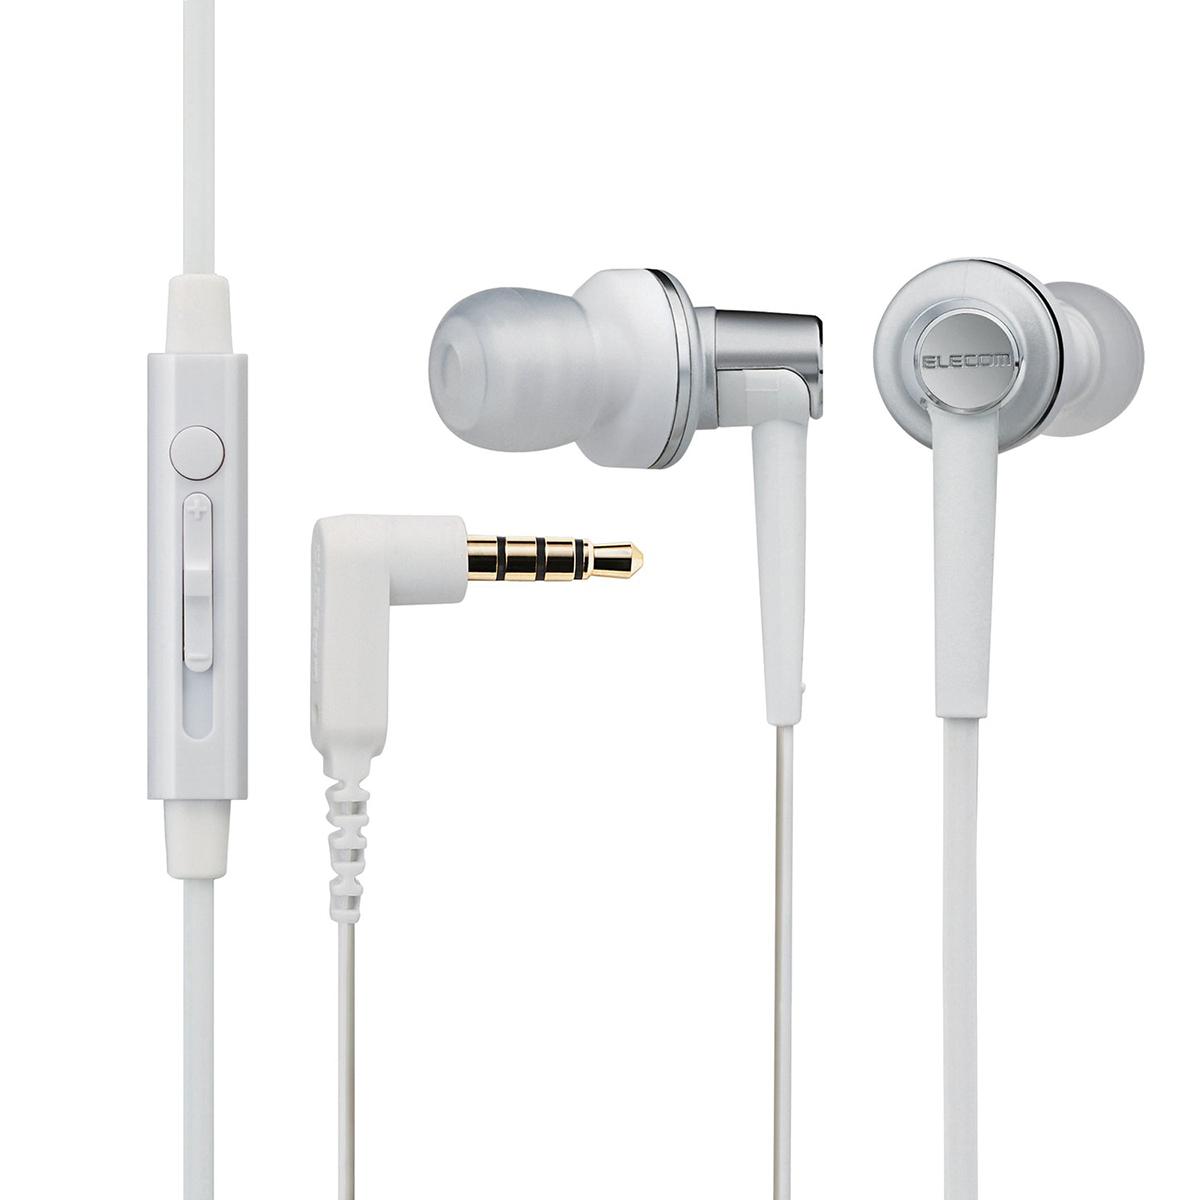 http://tikicdn.com/media/catalog/product/e/l/elecom-ehp-cs3560wh-g-1.jpg